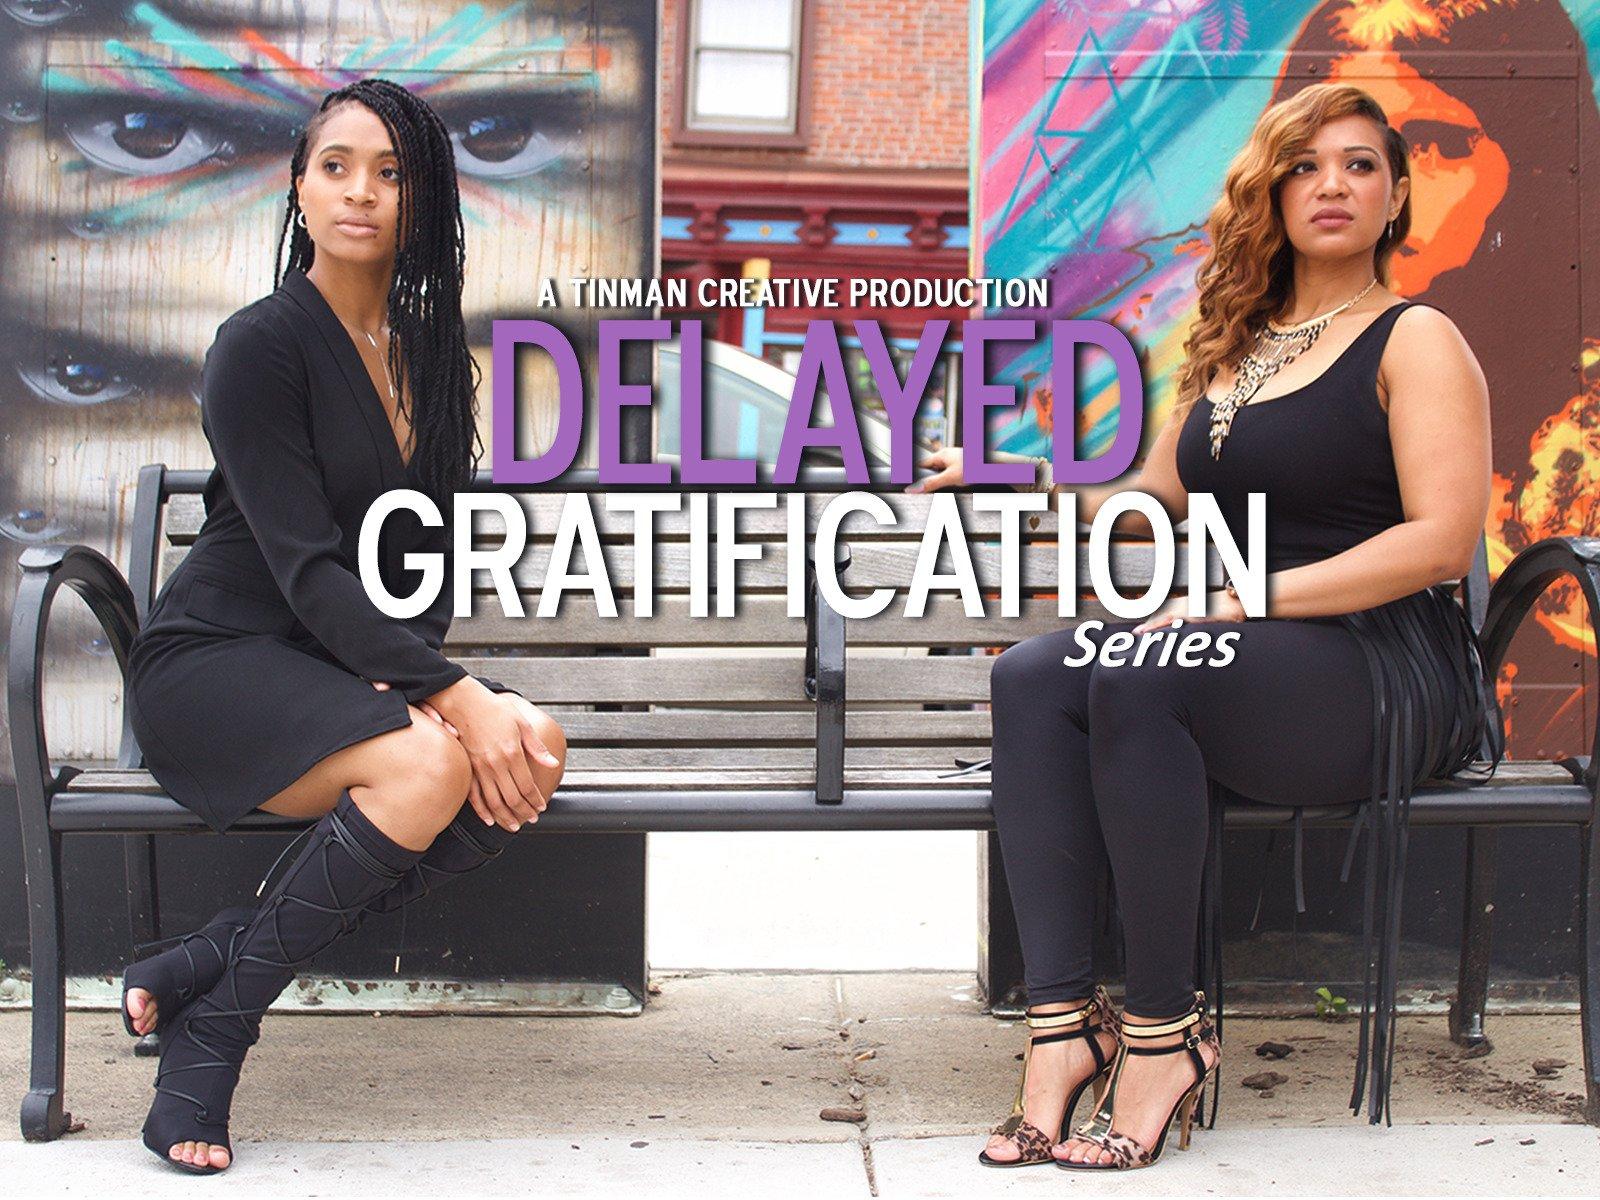 Delayed Gratification Series